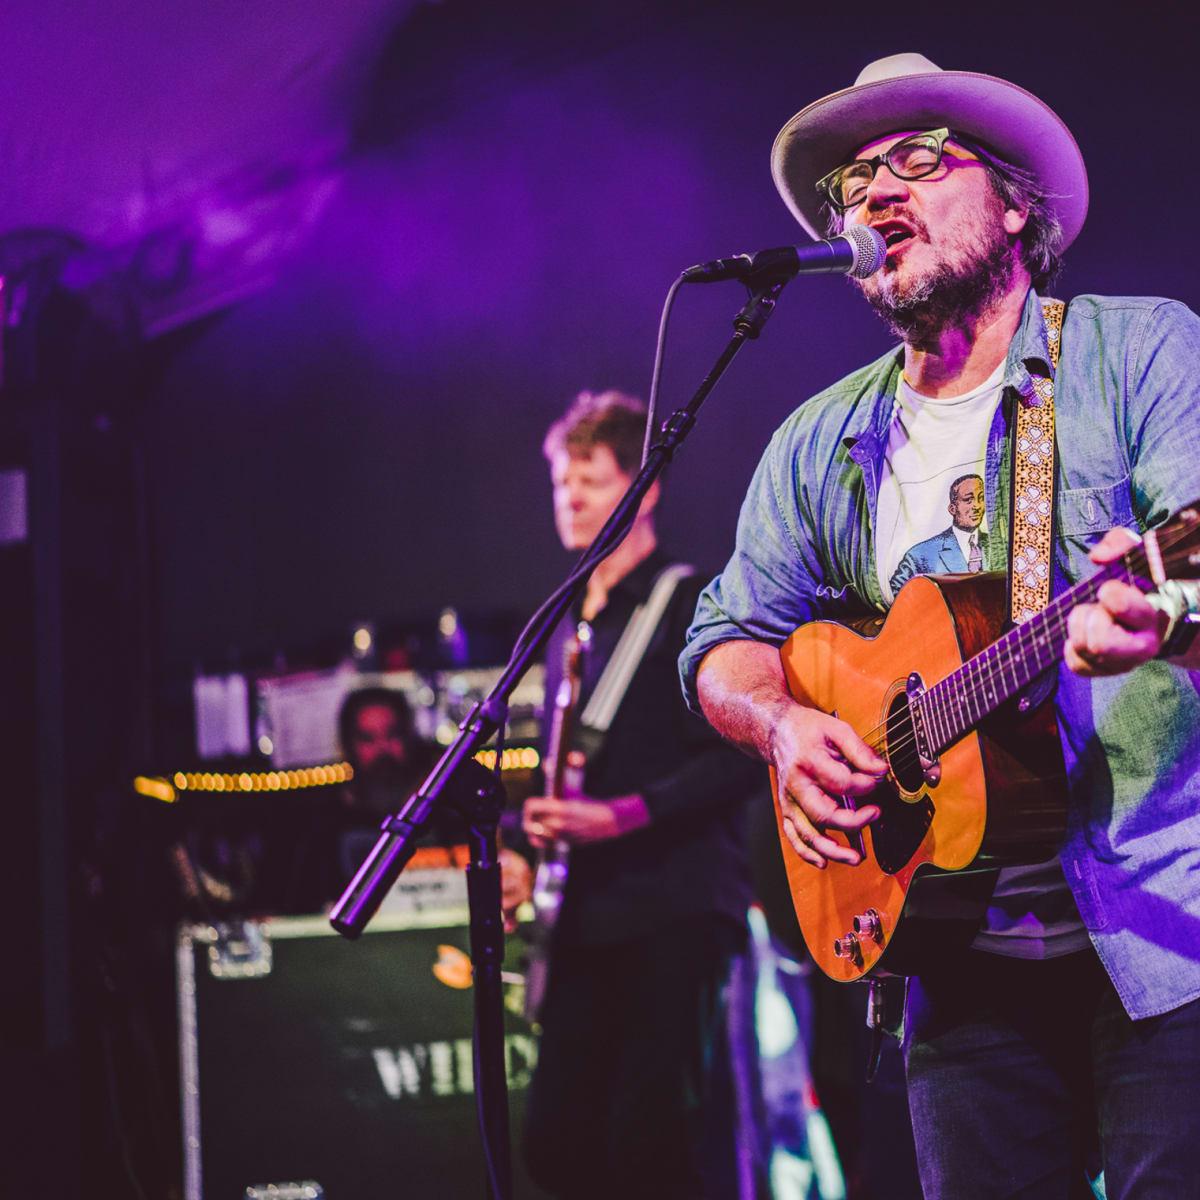 Wilco at Stubb's in Austin September 2015